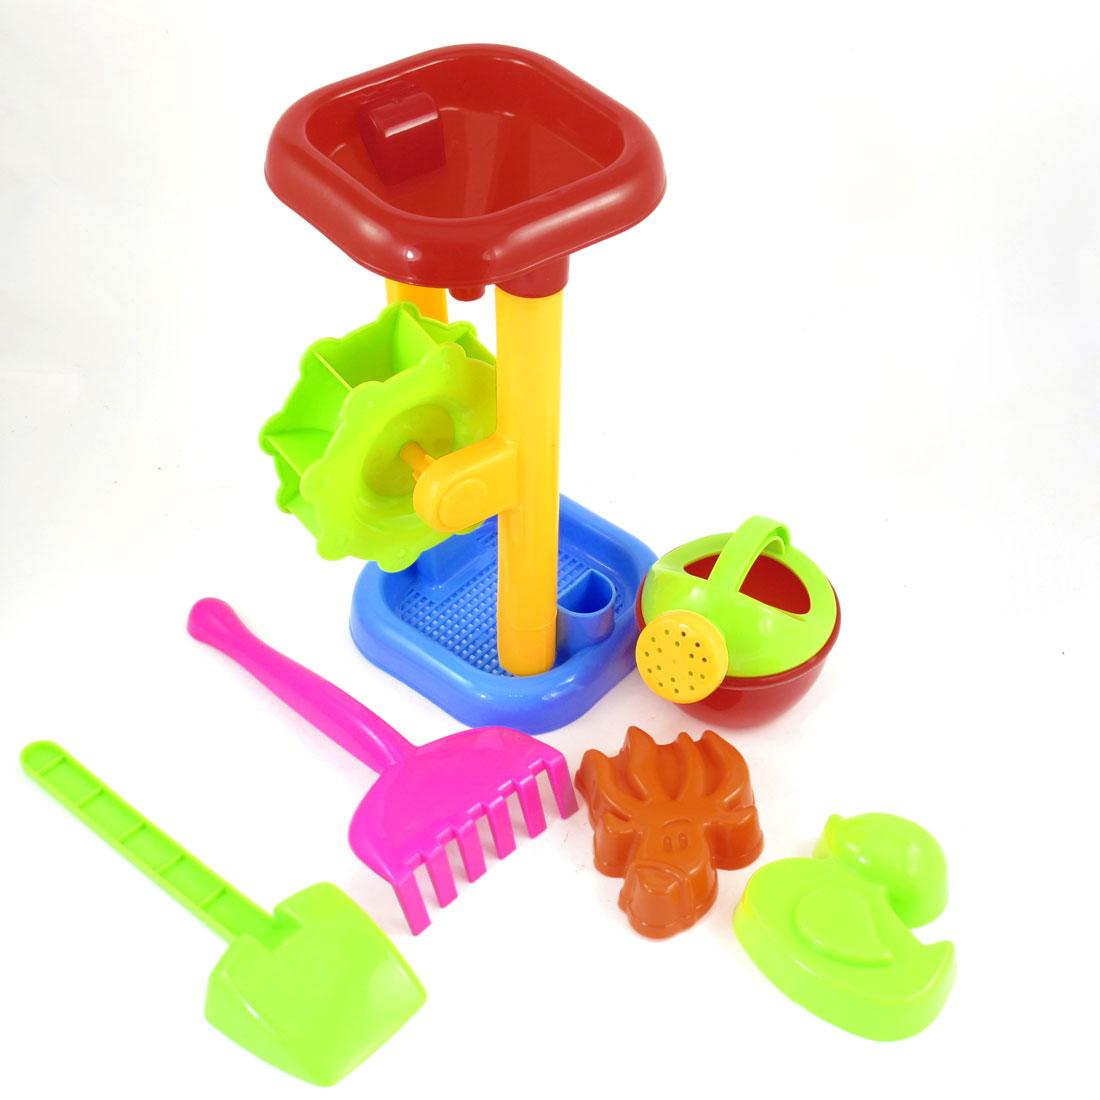 6-Pcs-Child-Colorful-Plastic-Frame-Filling-Funnel-Sand-Filter-Rake-Beach-Toy-Set